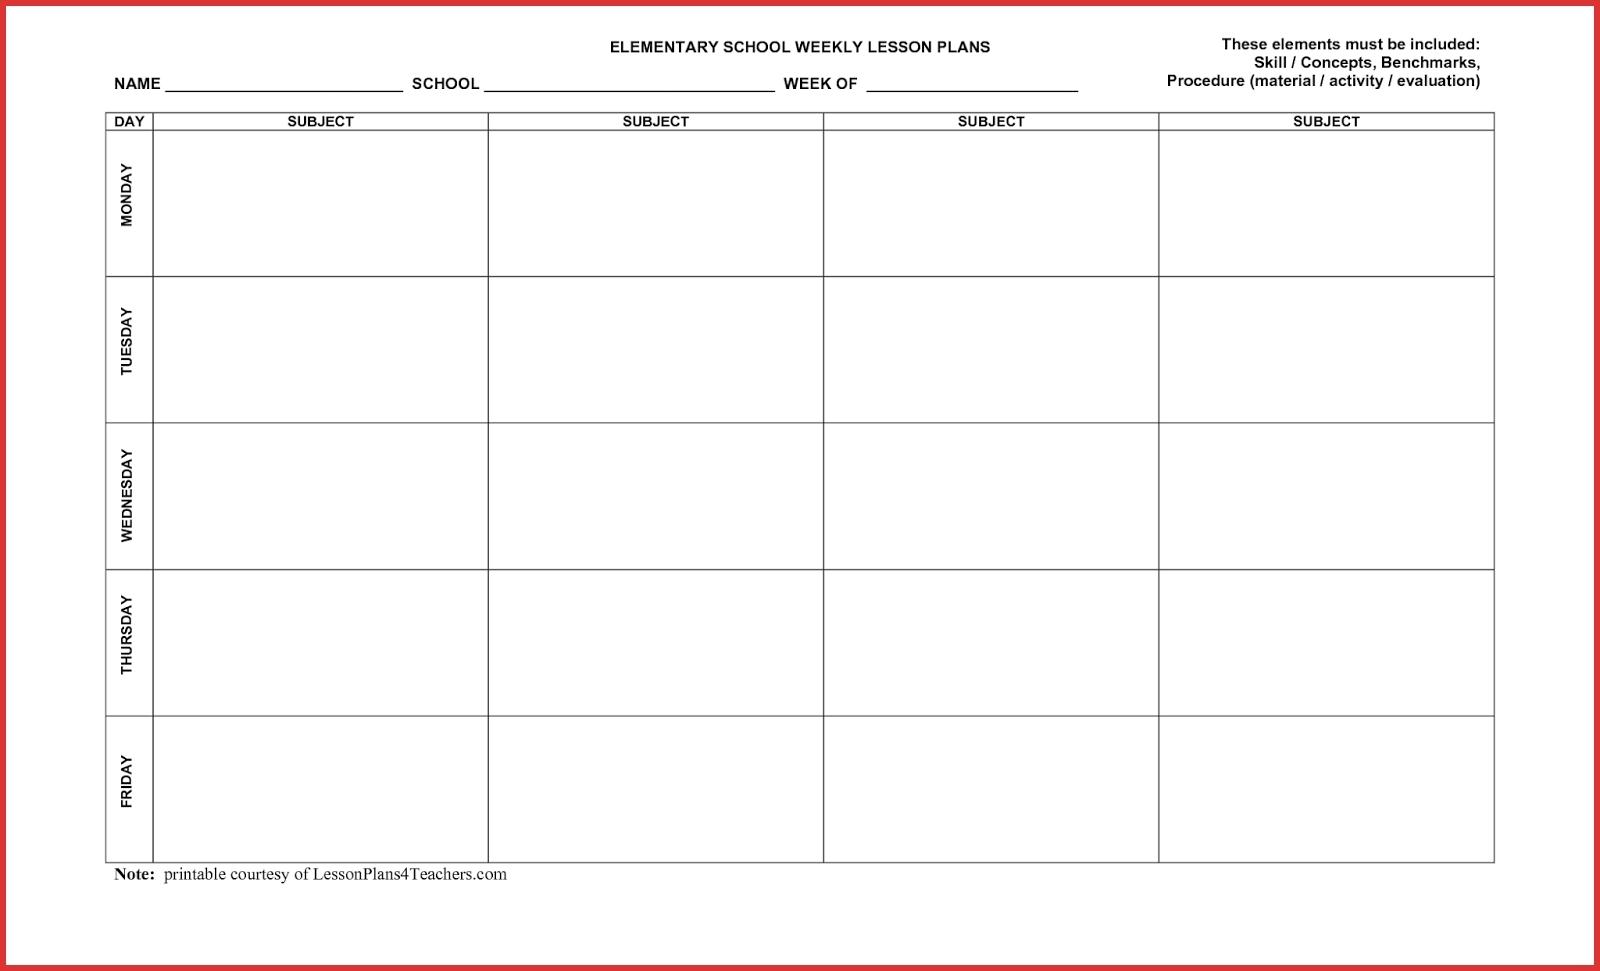 Day Weekly Calendar Template E2 80 93 Week Schedule Microsoft Word for Blank Calendar 5 Day Week